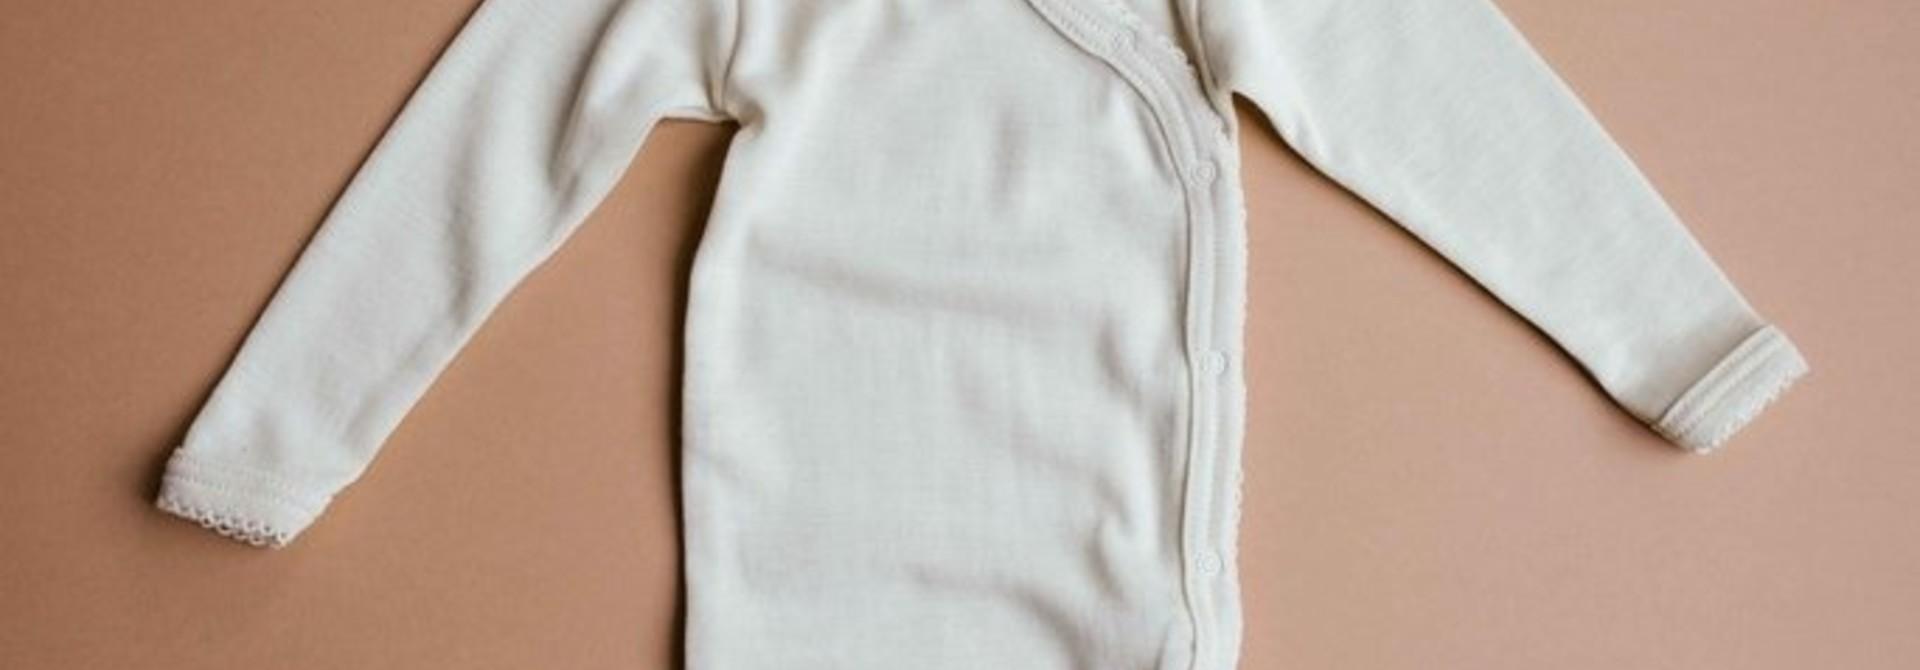 Wrap around baby body - naturel crochet edge